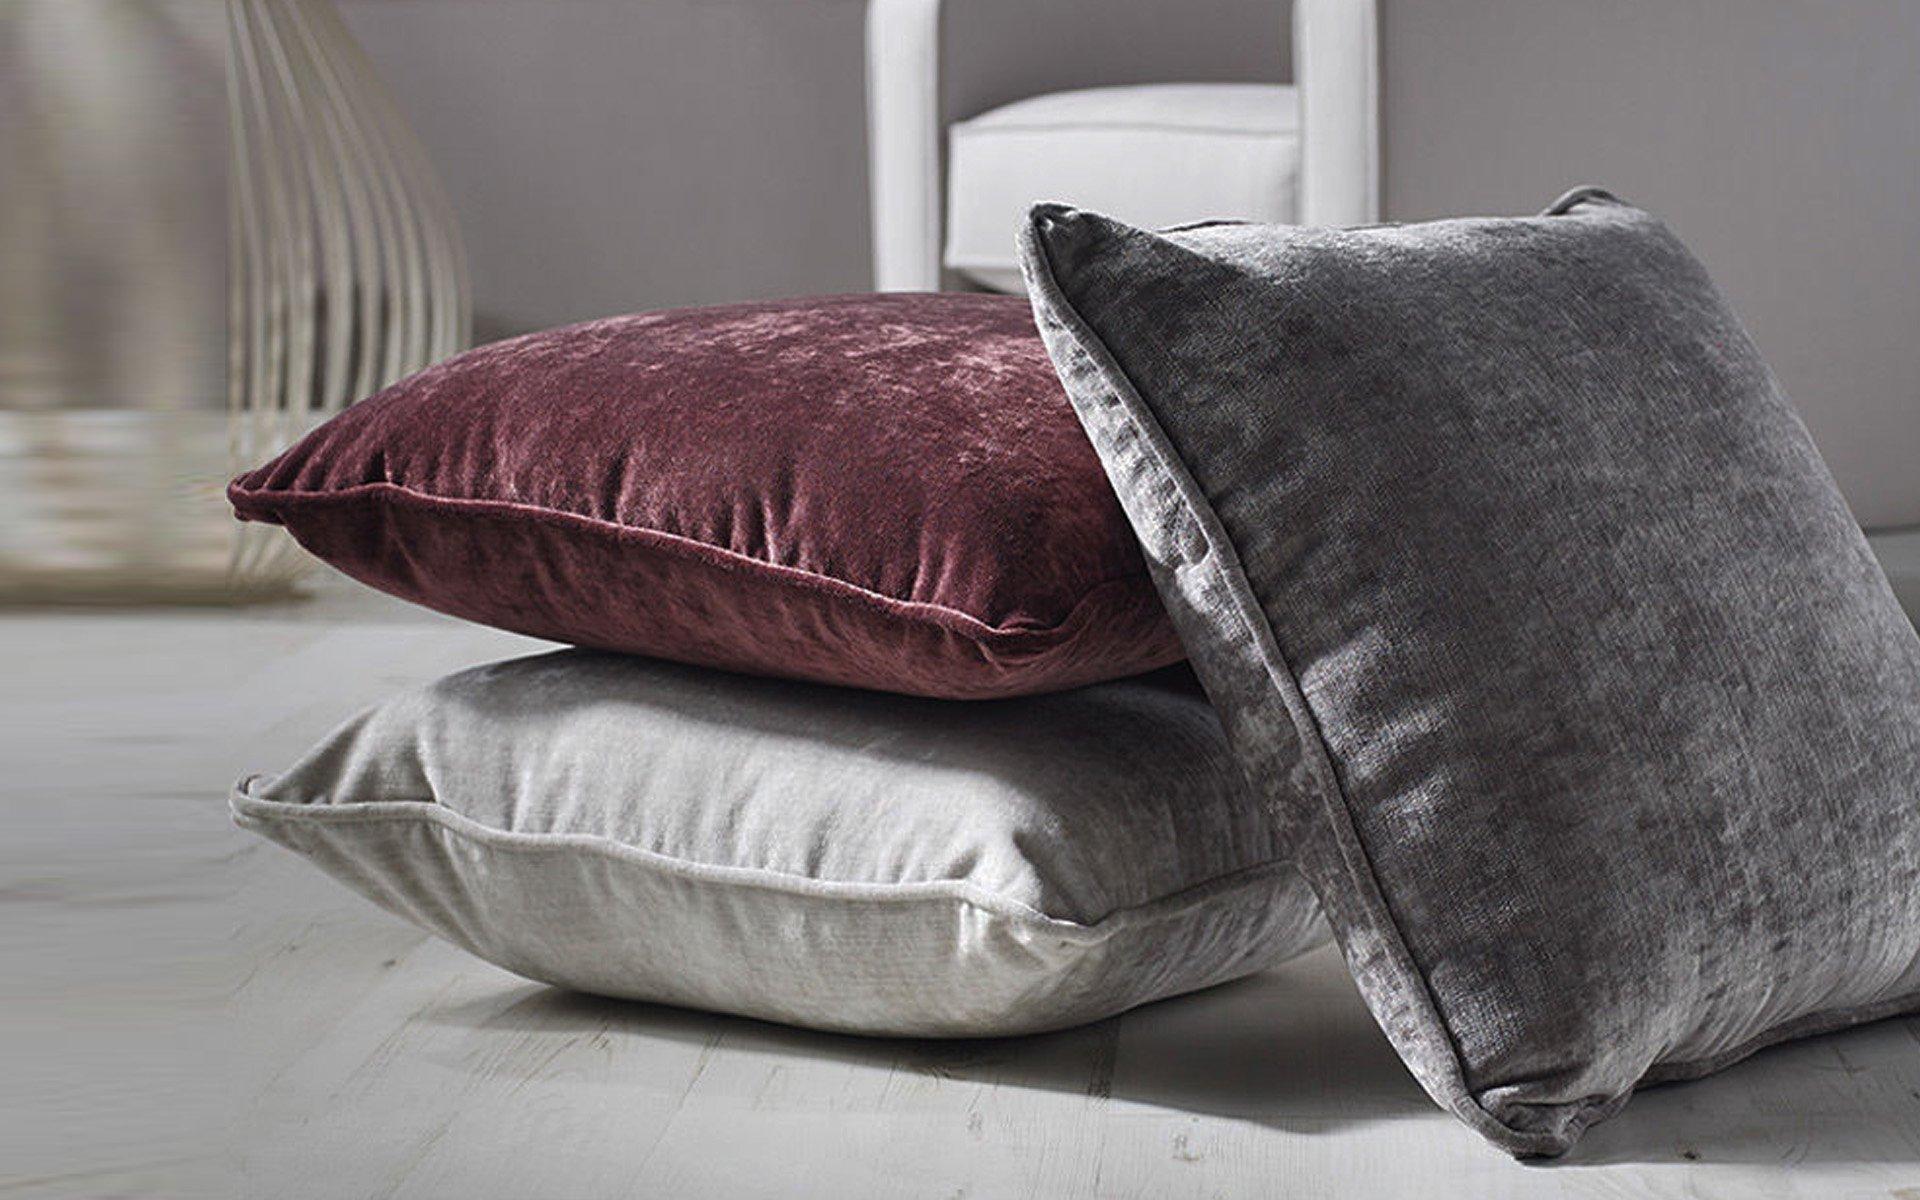 Furnishings & Upholstery